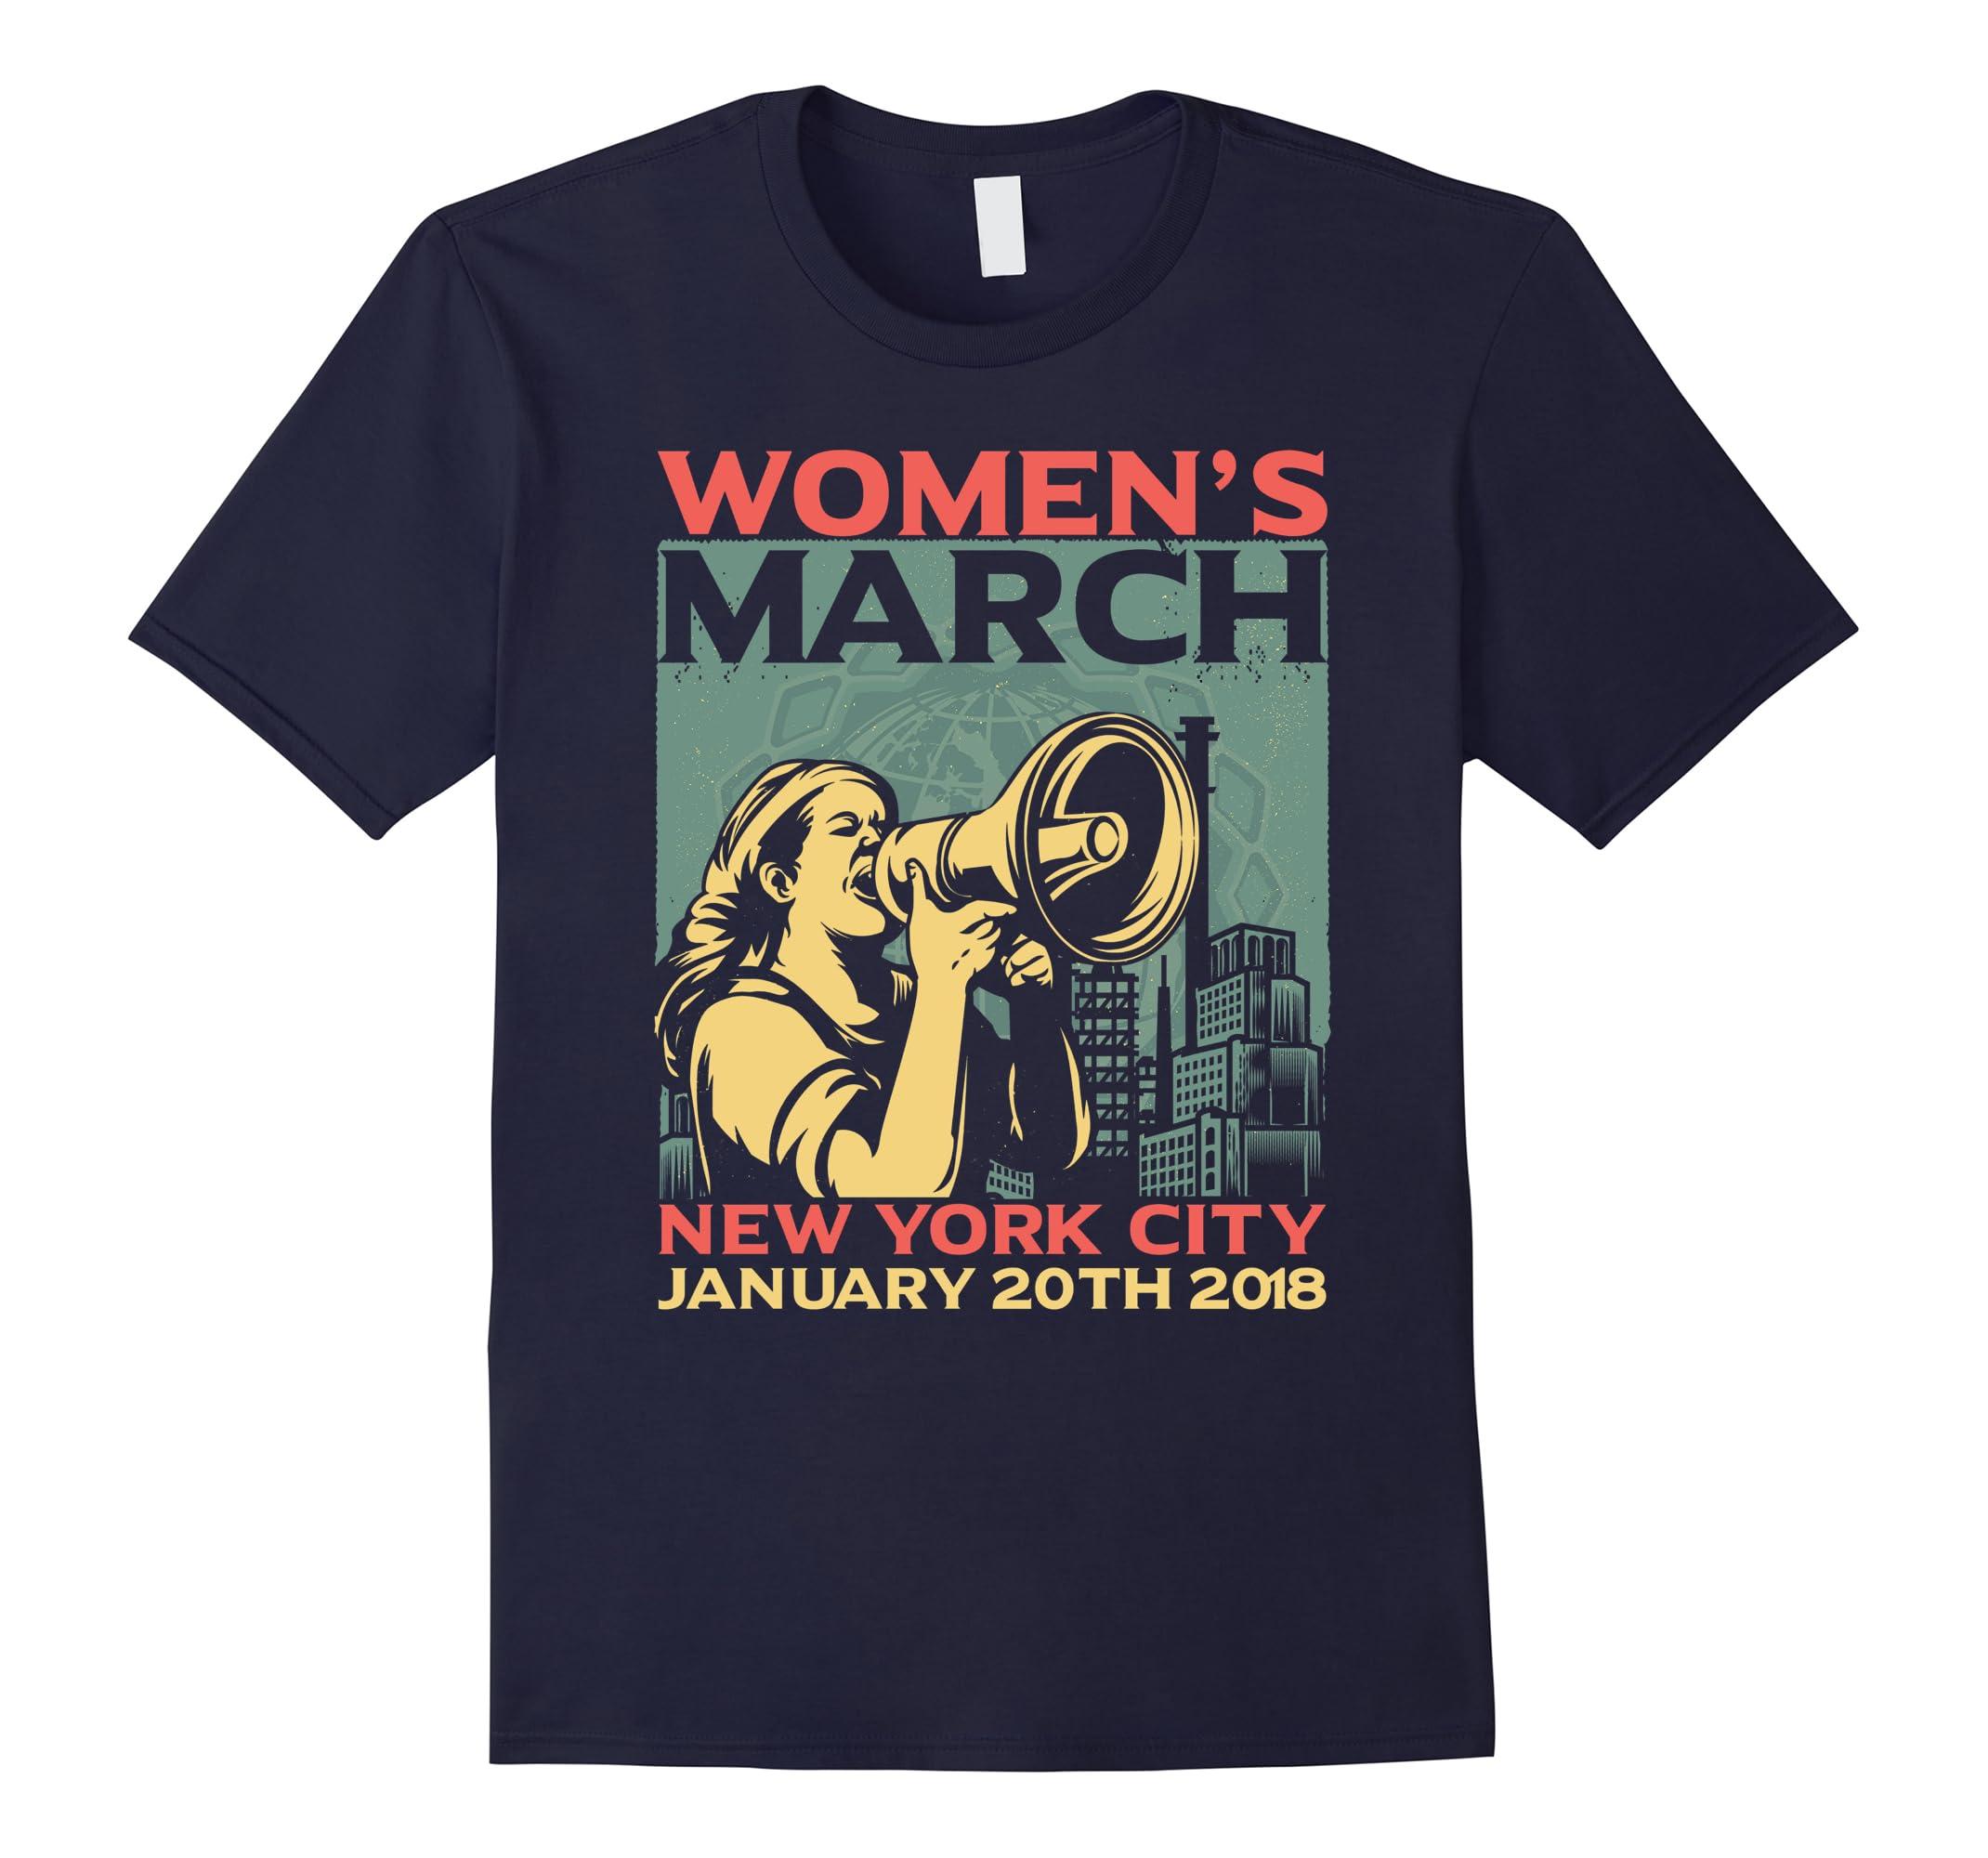 Women's March New York 2018 Vintage Retro T-shirt-ah my shirt one gift